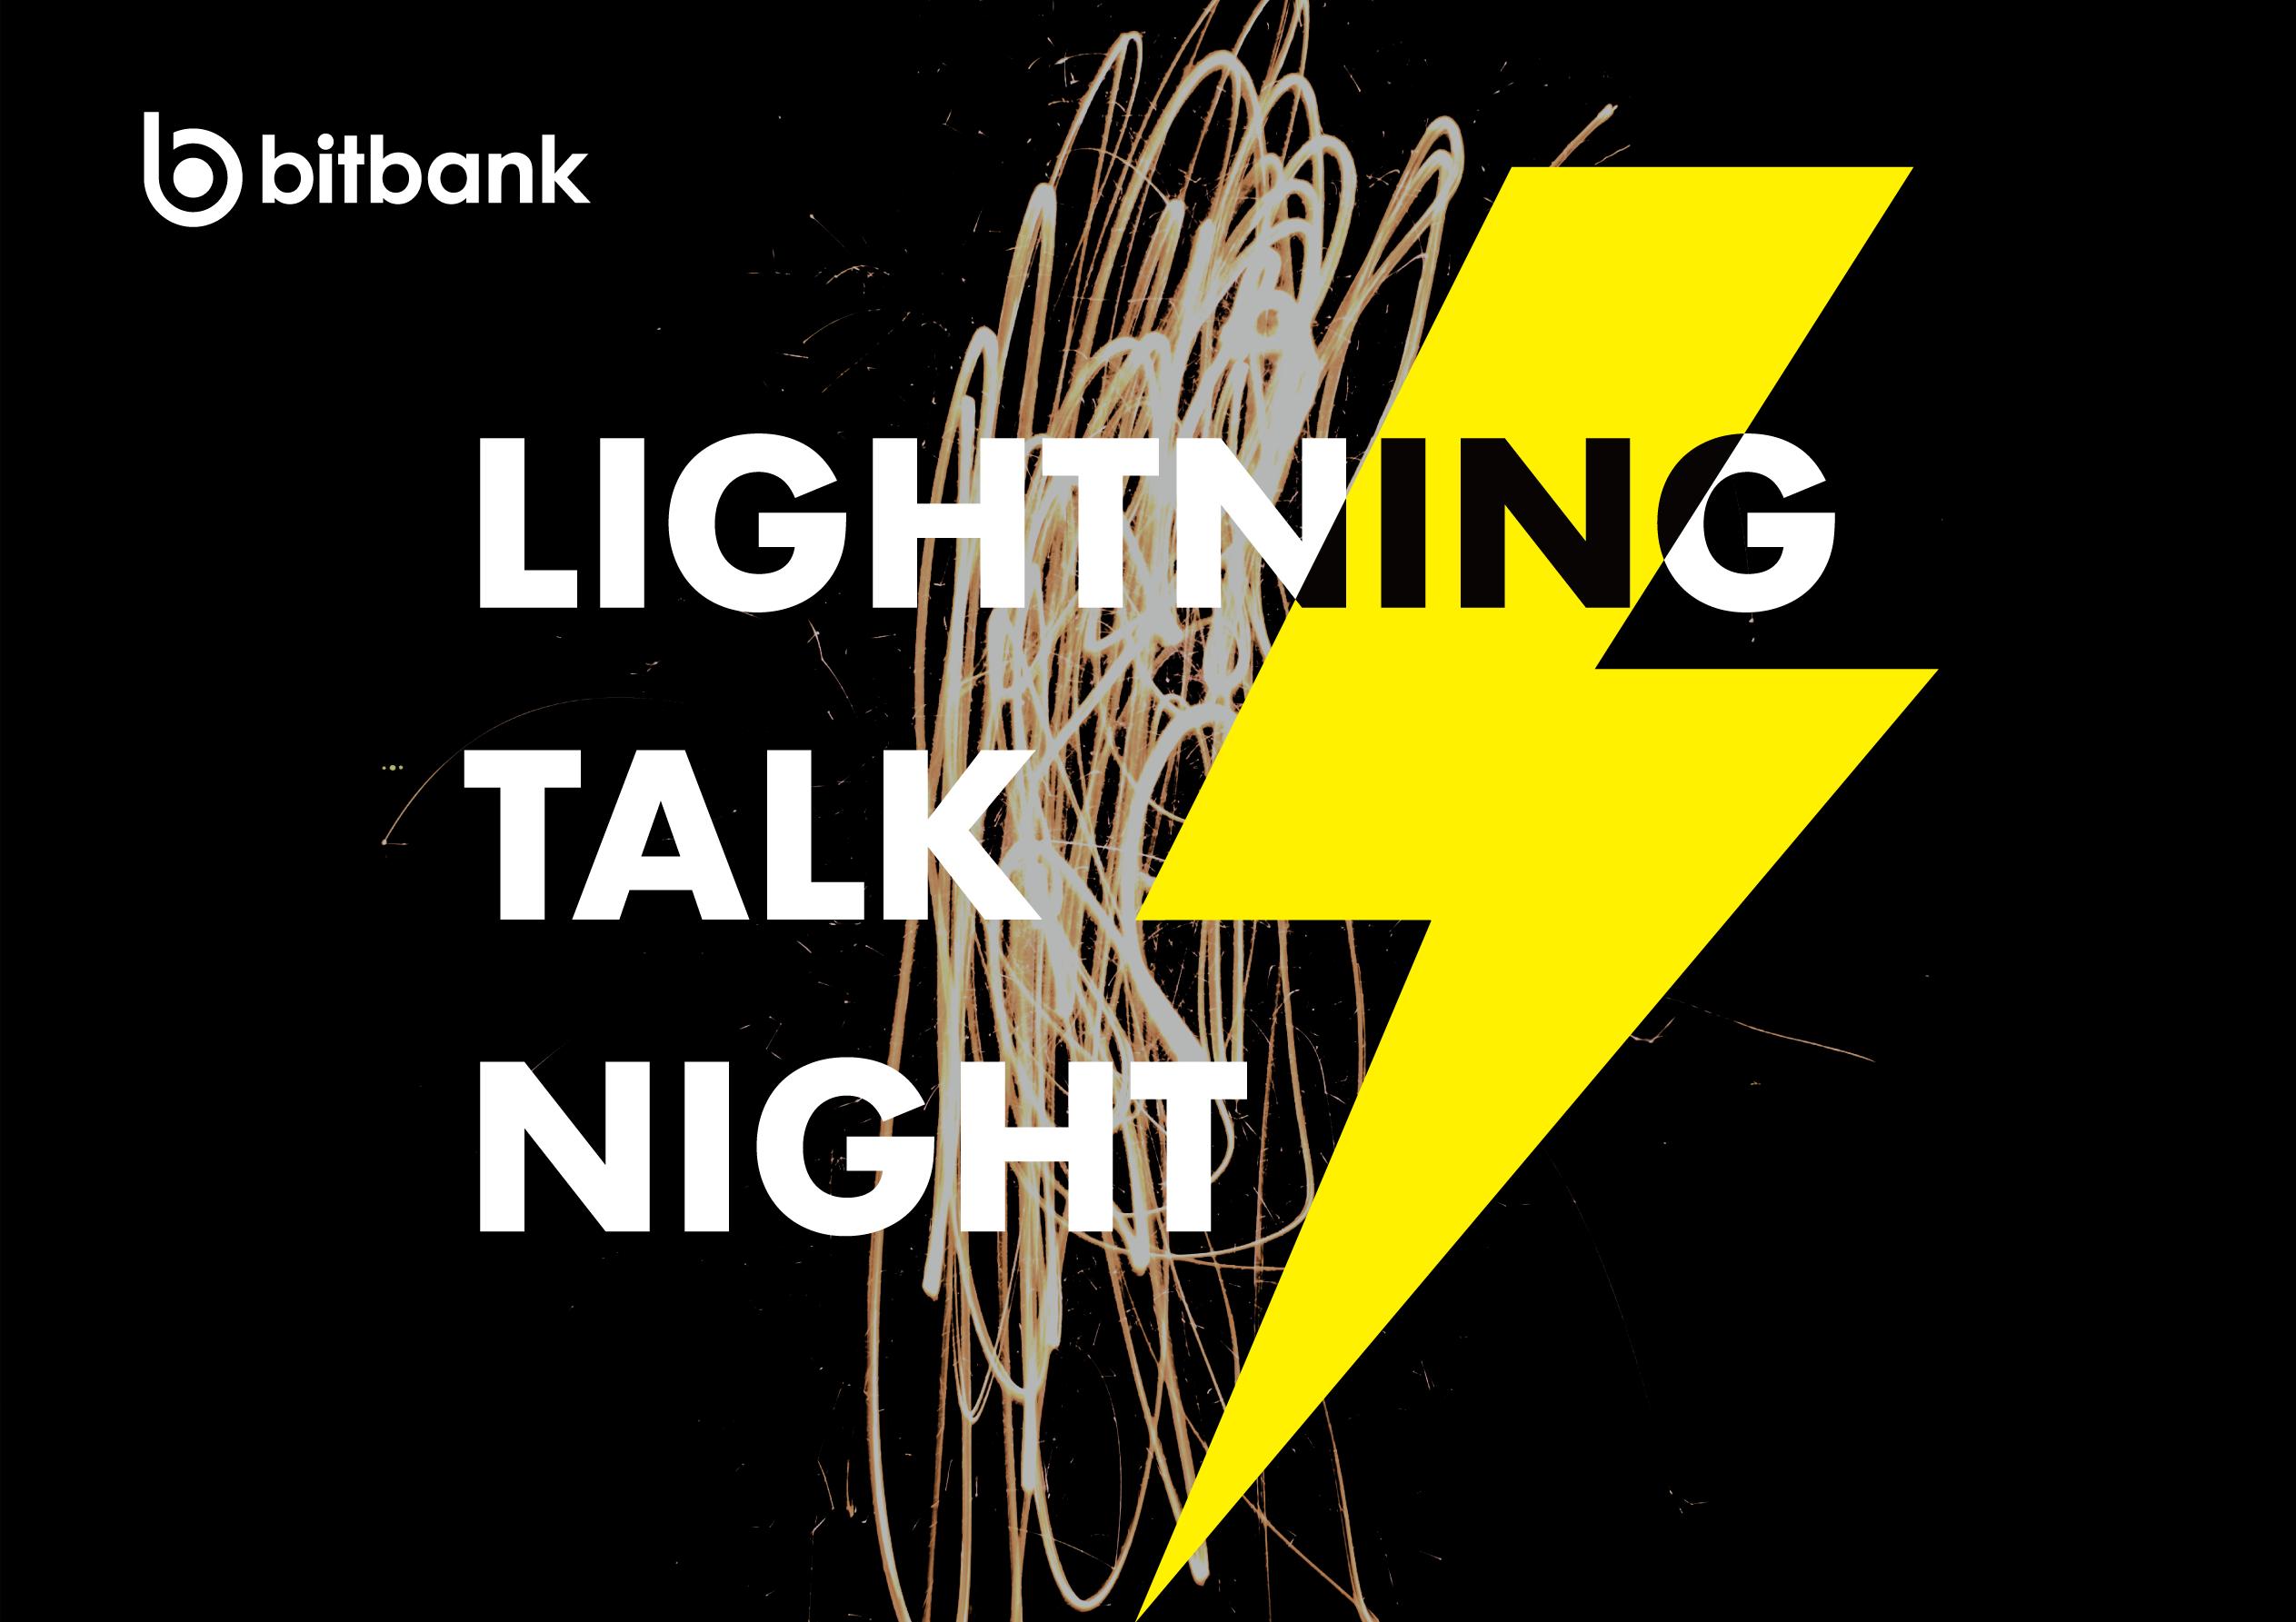 bitbank LT Night #2 ~Node.js~を開催しました